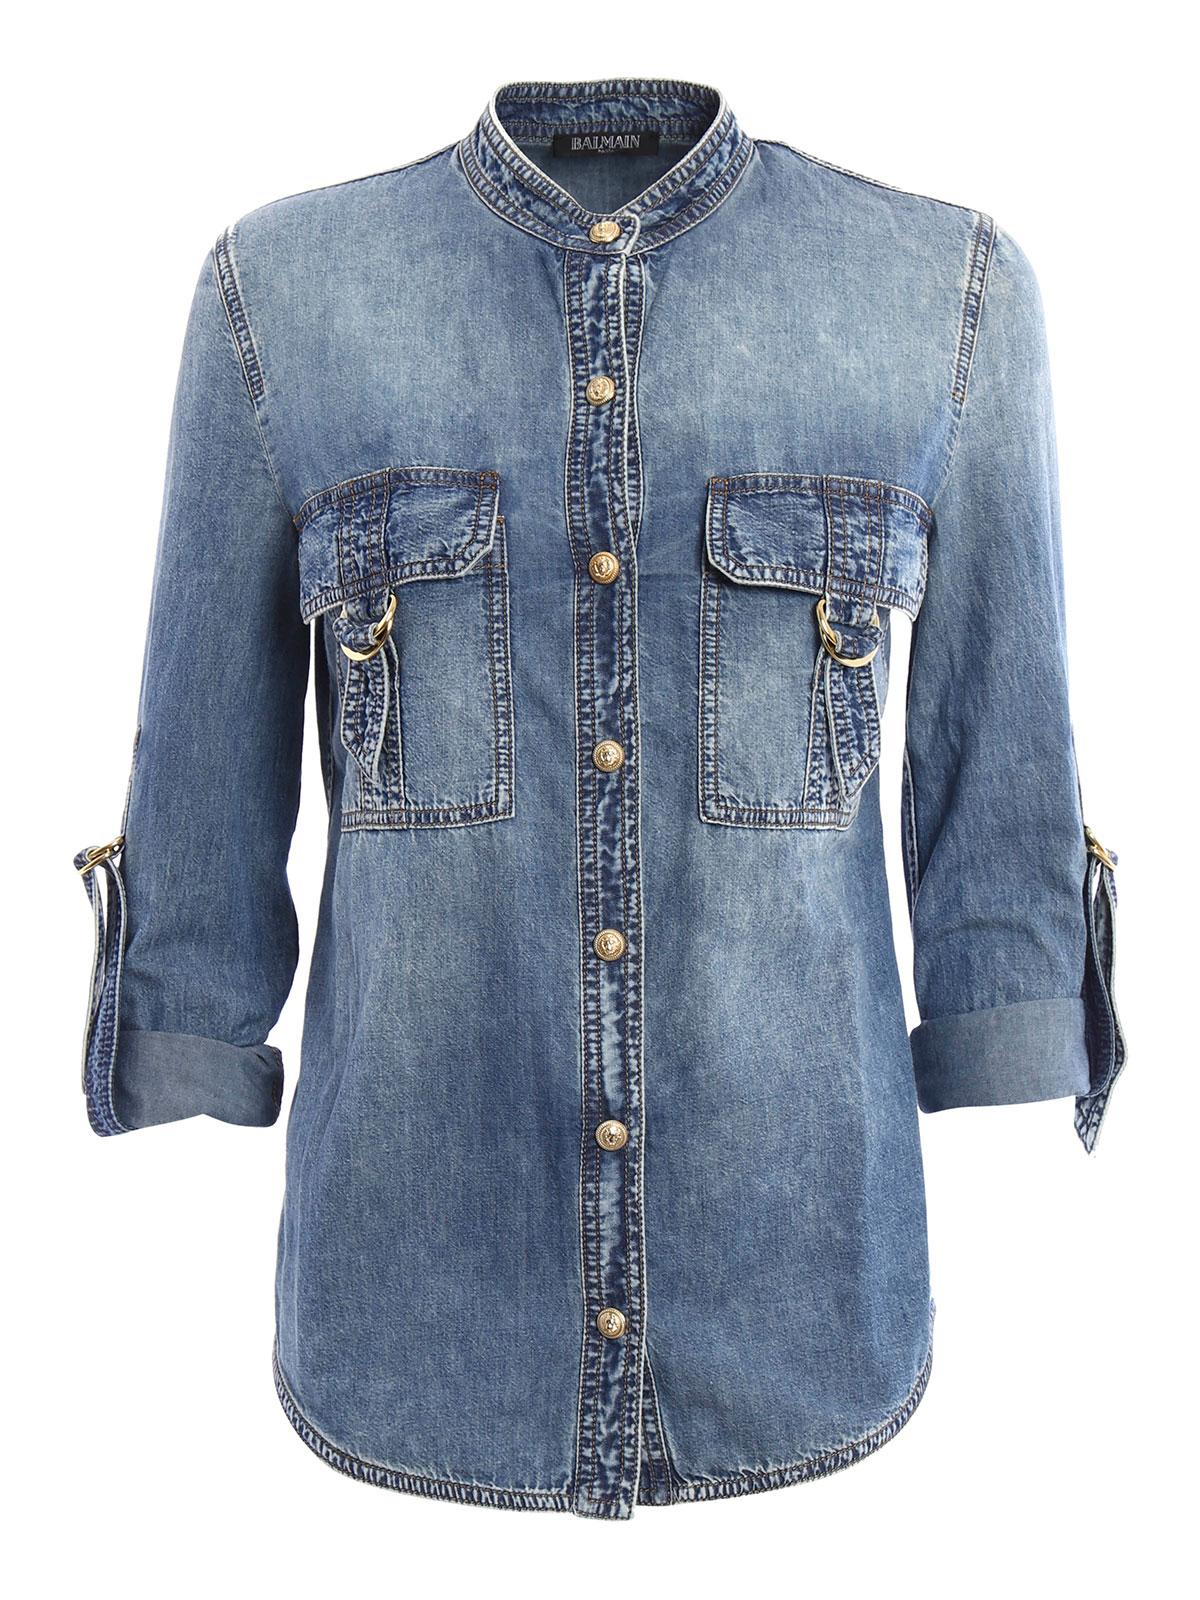 Safari Shirt Cognac Heels: Cotton Denim Safari Shirt